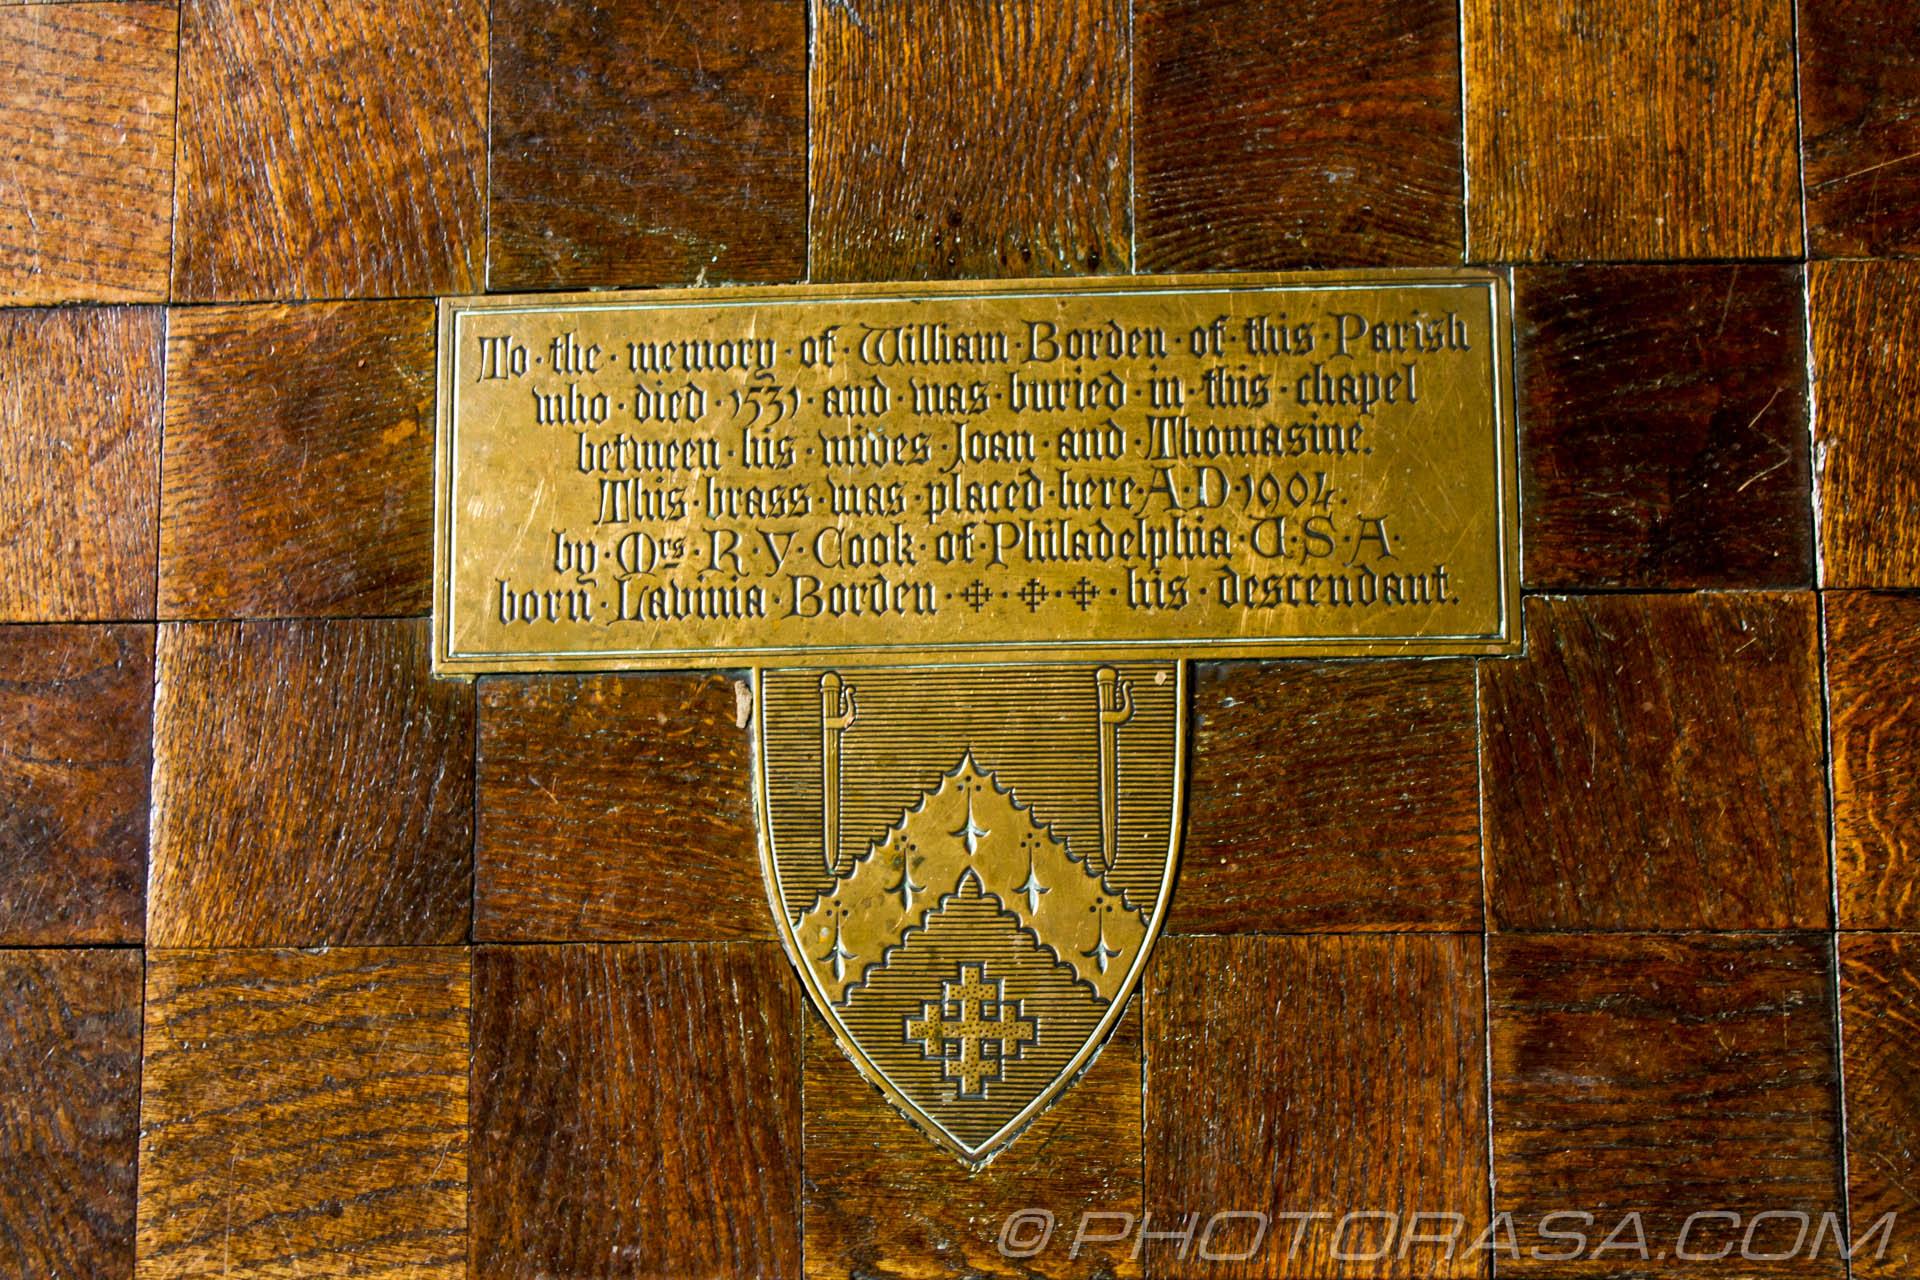 http://photorasa.com/parish-church-st-peter-st-paul-headcorn/brass-floor-plaque/